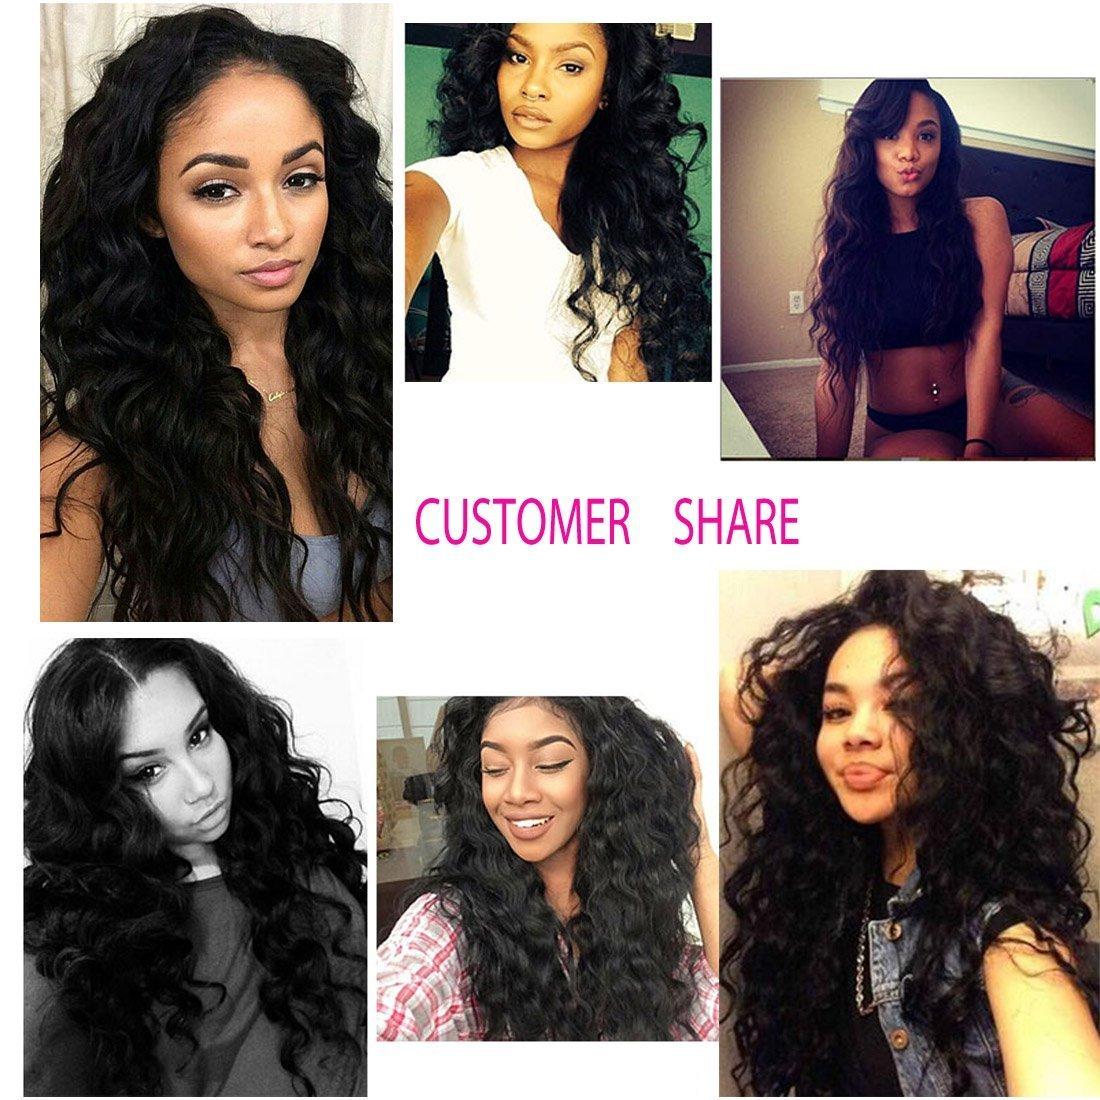 Unice 7A Grade Brazilian Natural Wave Hair 100% Virgin Human Hair 3 Bundles with Closure Natural Color (20 22 24+18Free Closure) by UNICE (Image #7)